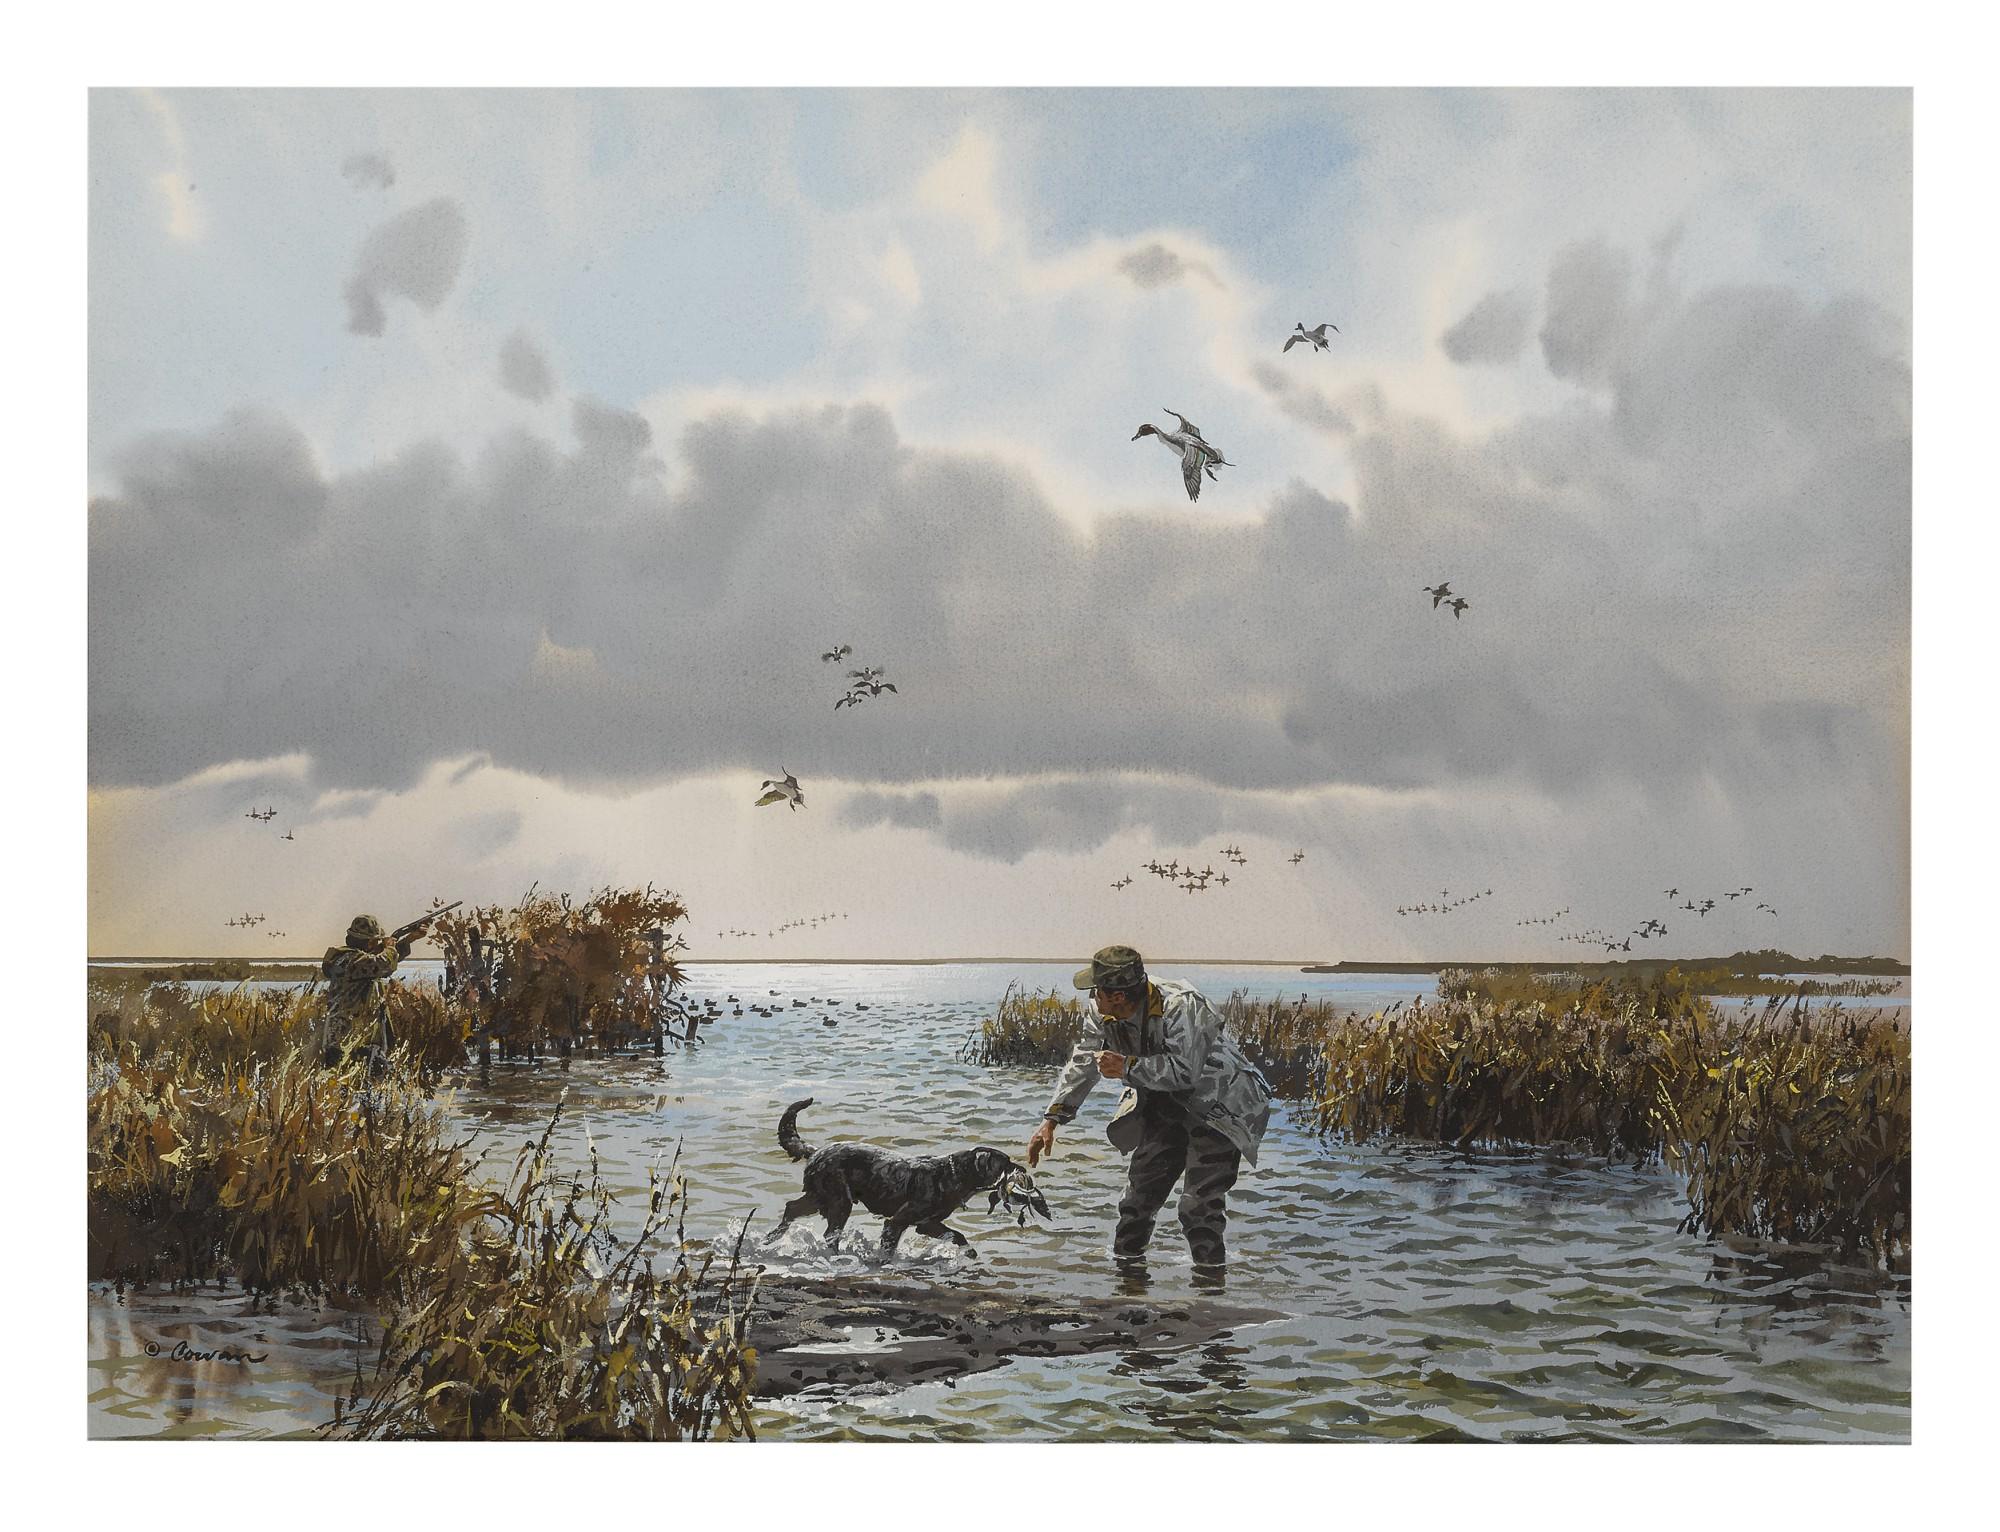 JOHN COWAN | THE GRASSY BLIND